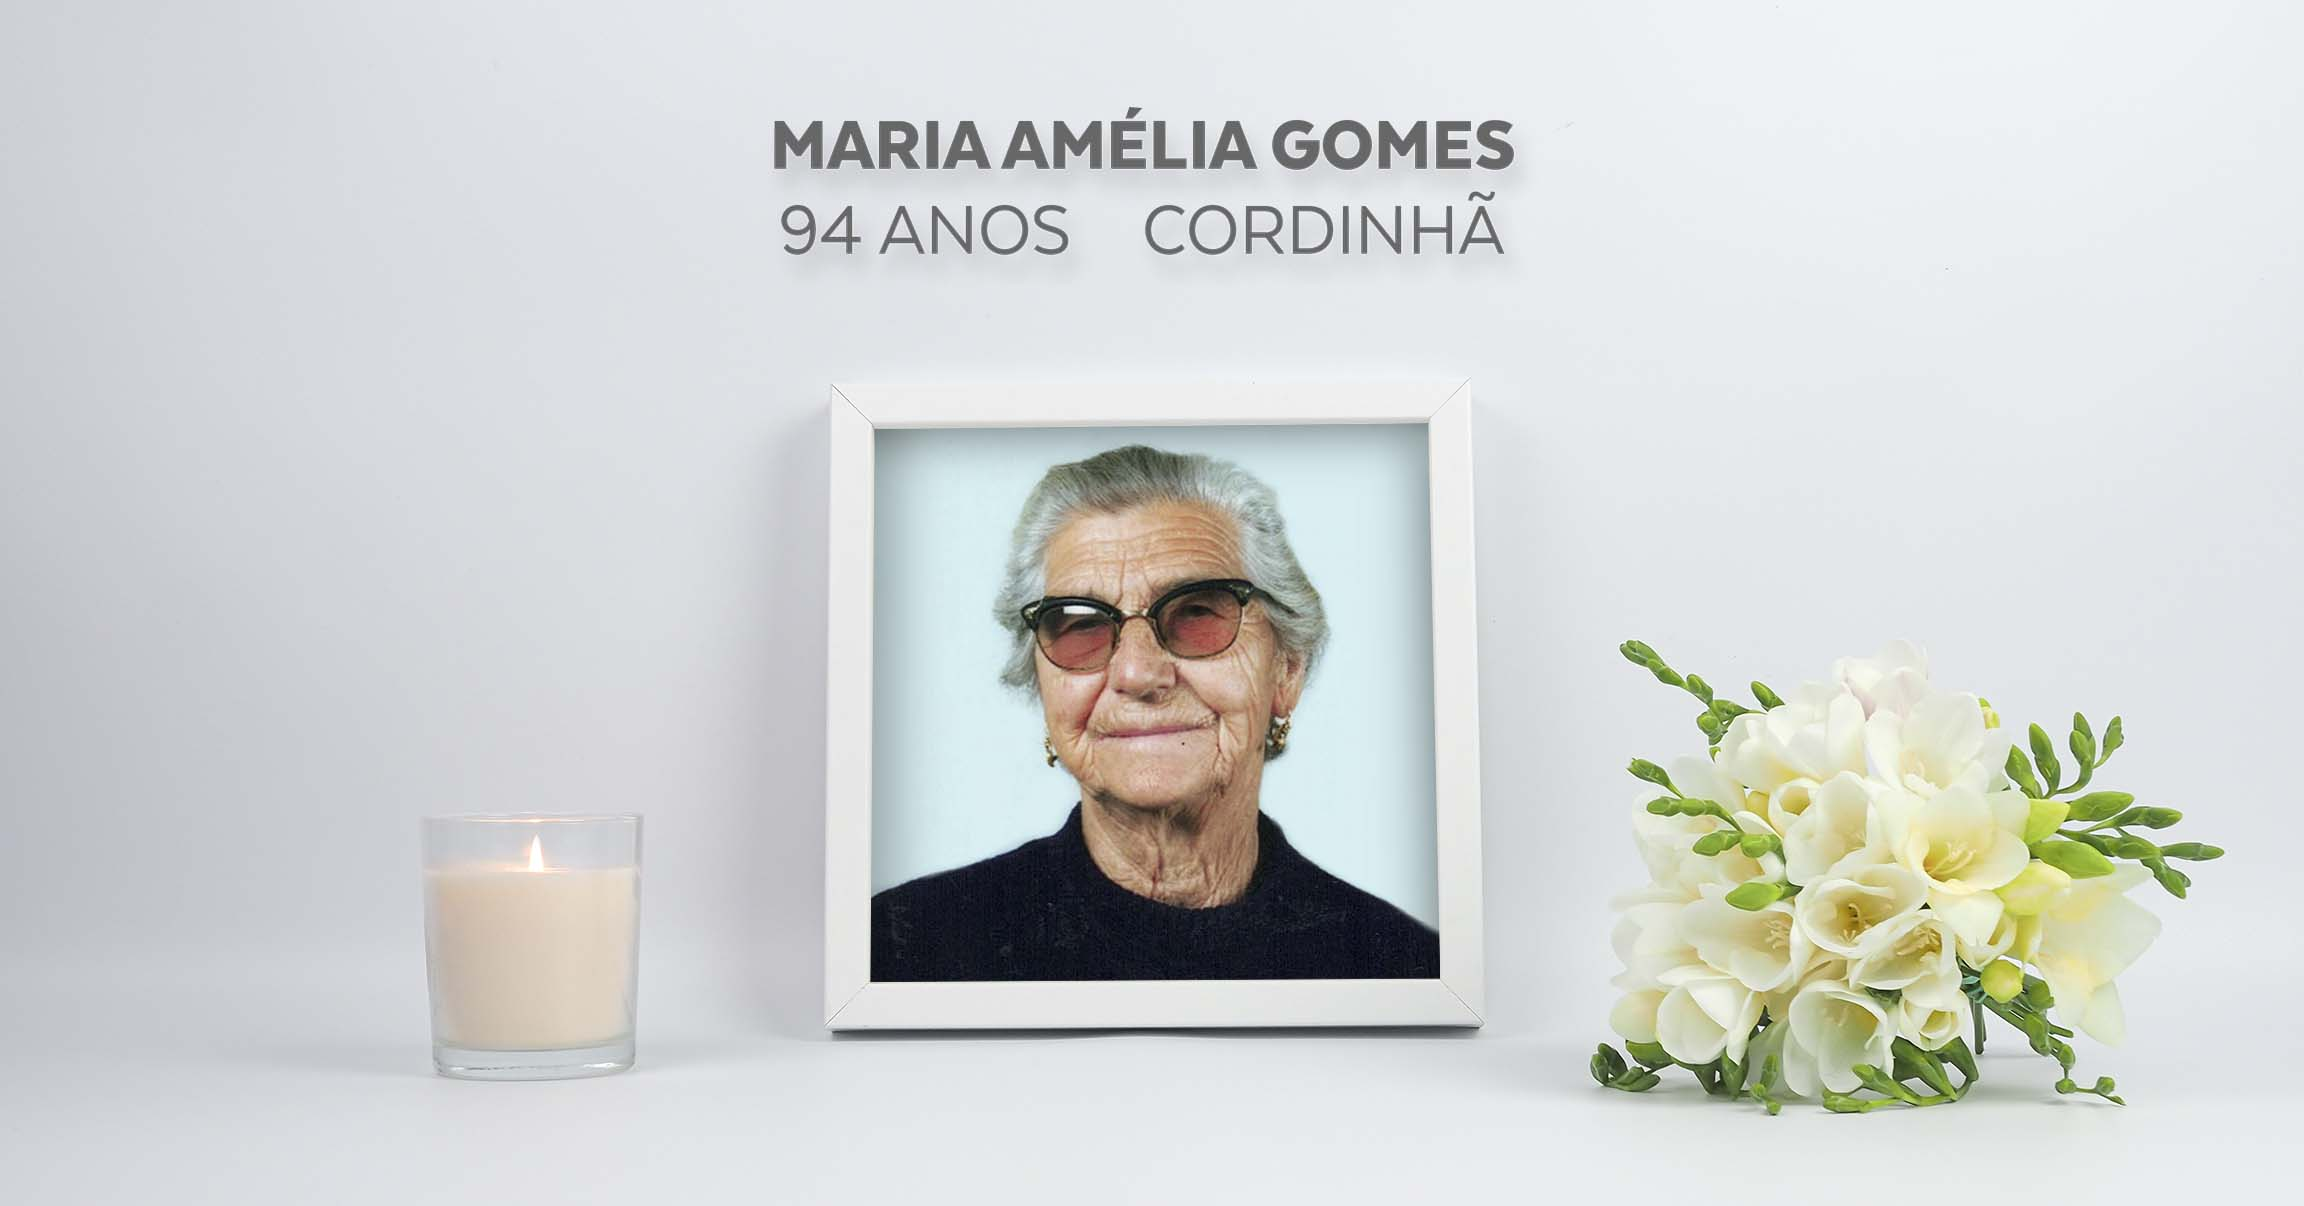 Maria Amélia Gomes